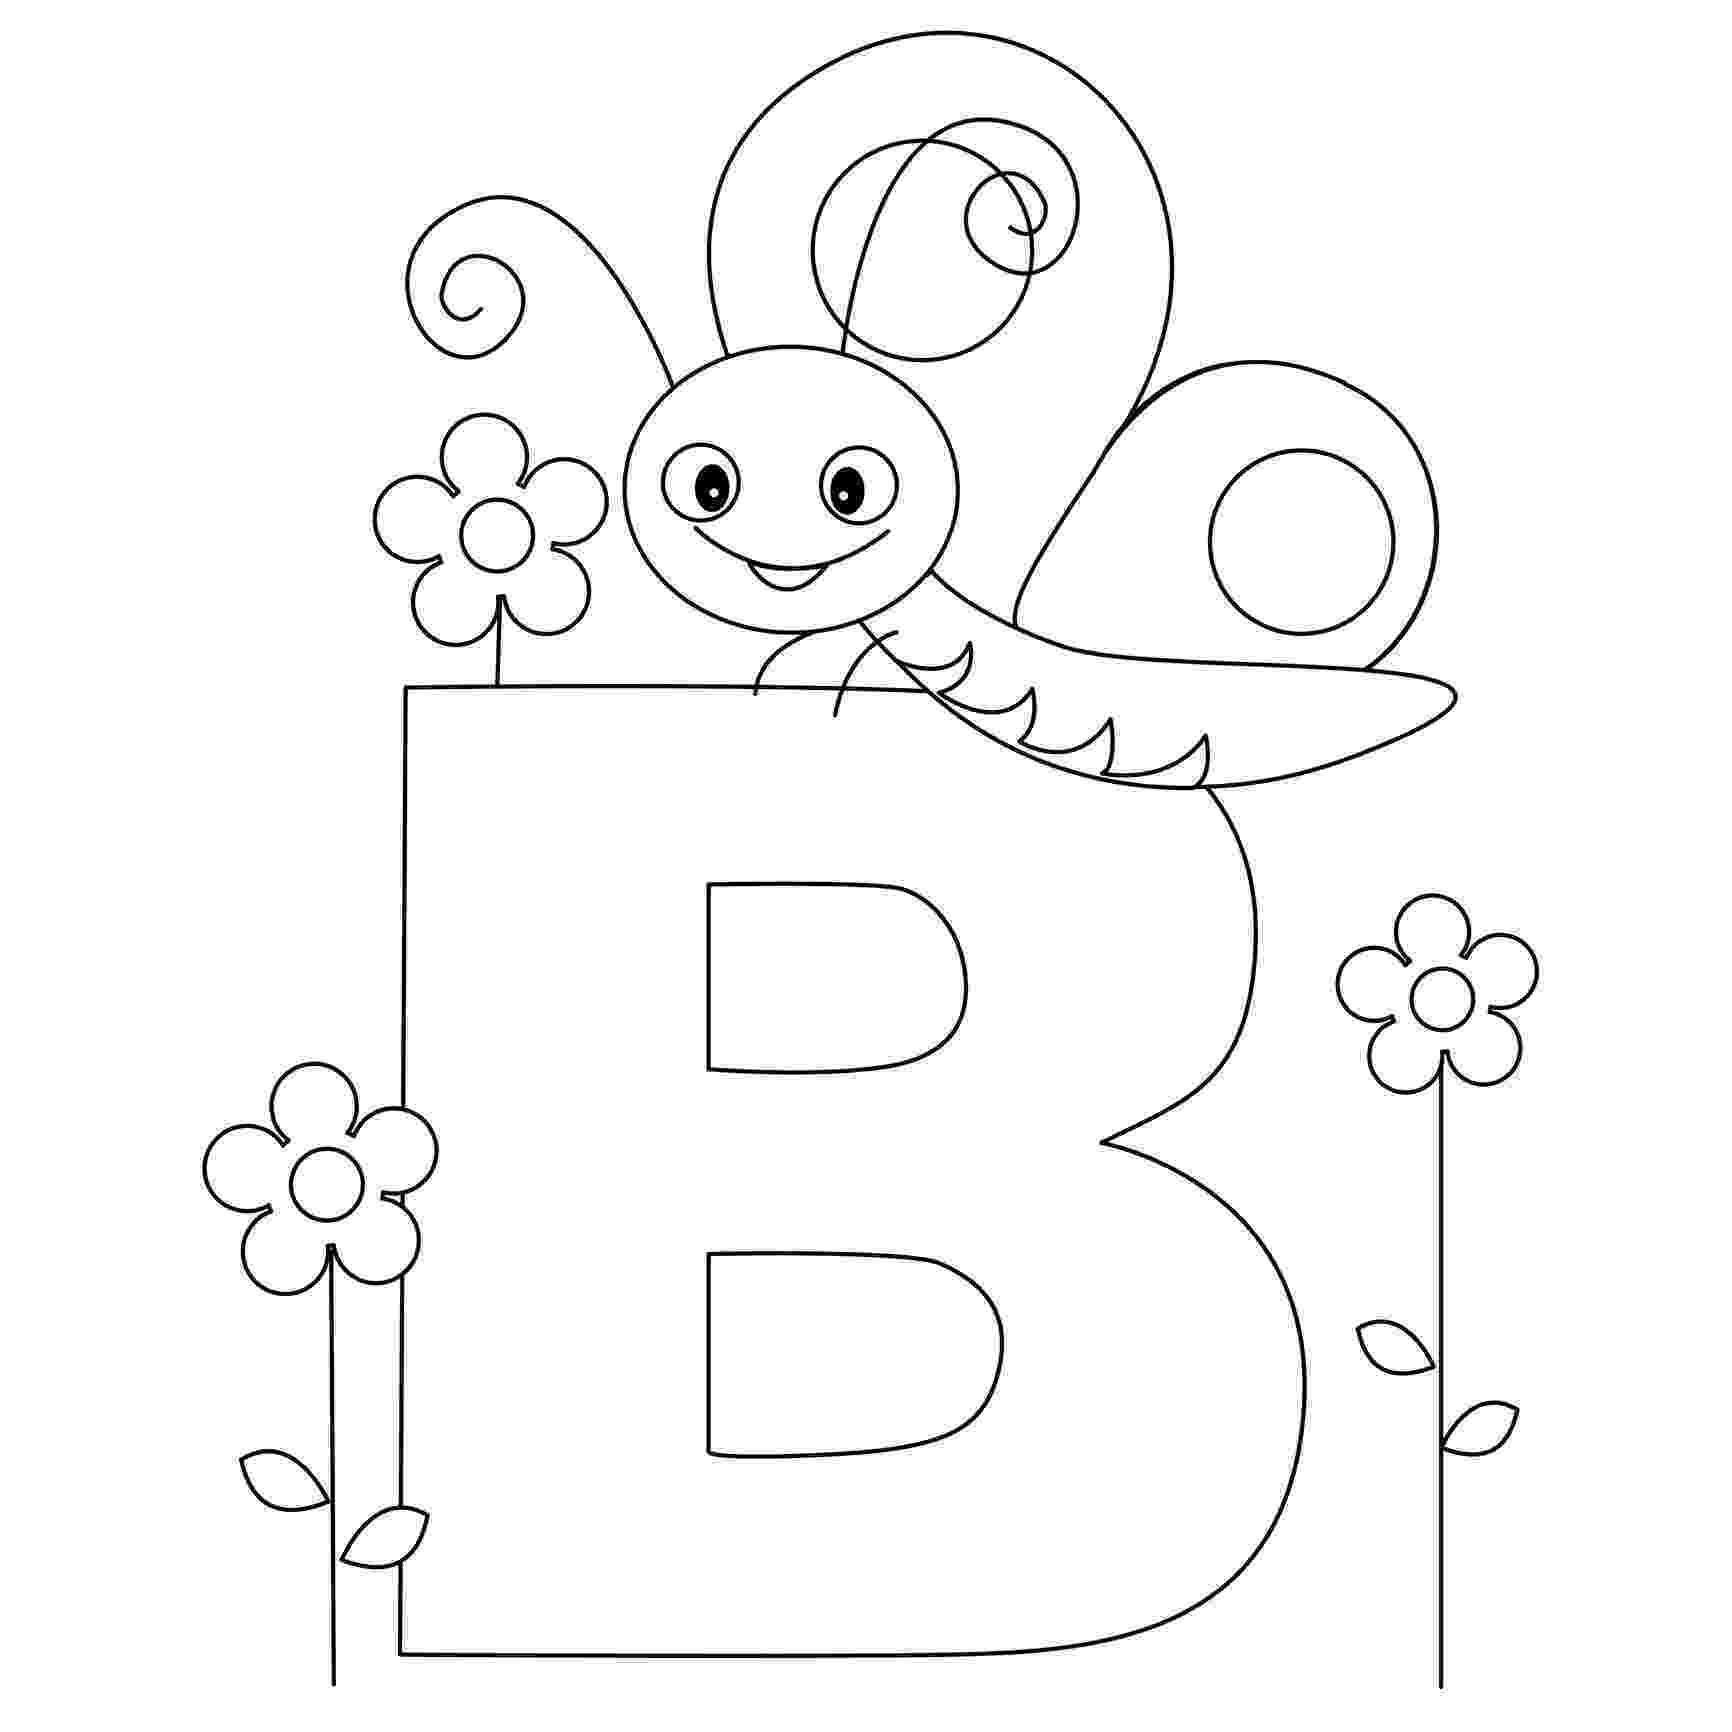 coloring animal alphabet free printable alphabet coloring pages for kids best animal coloring alphabet 1 3